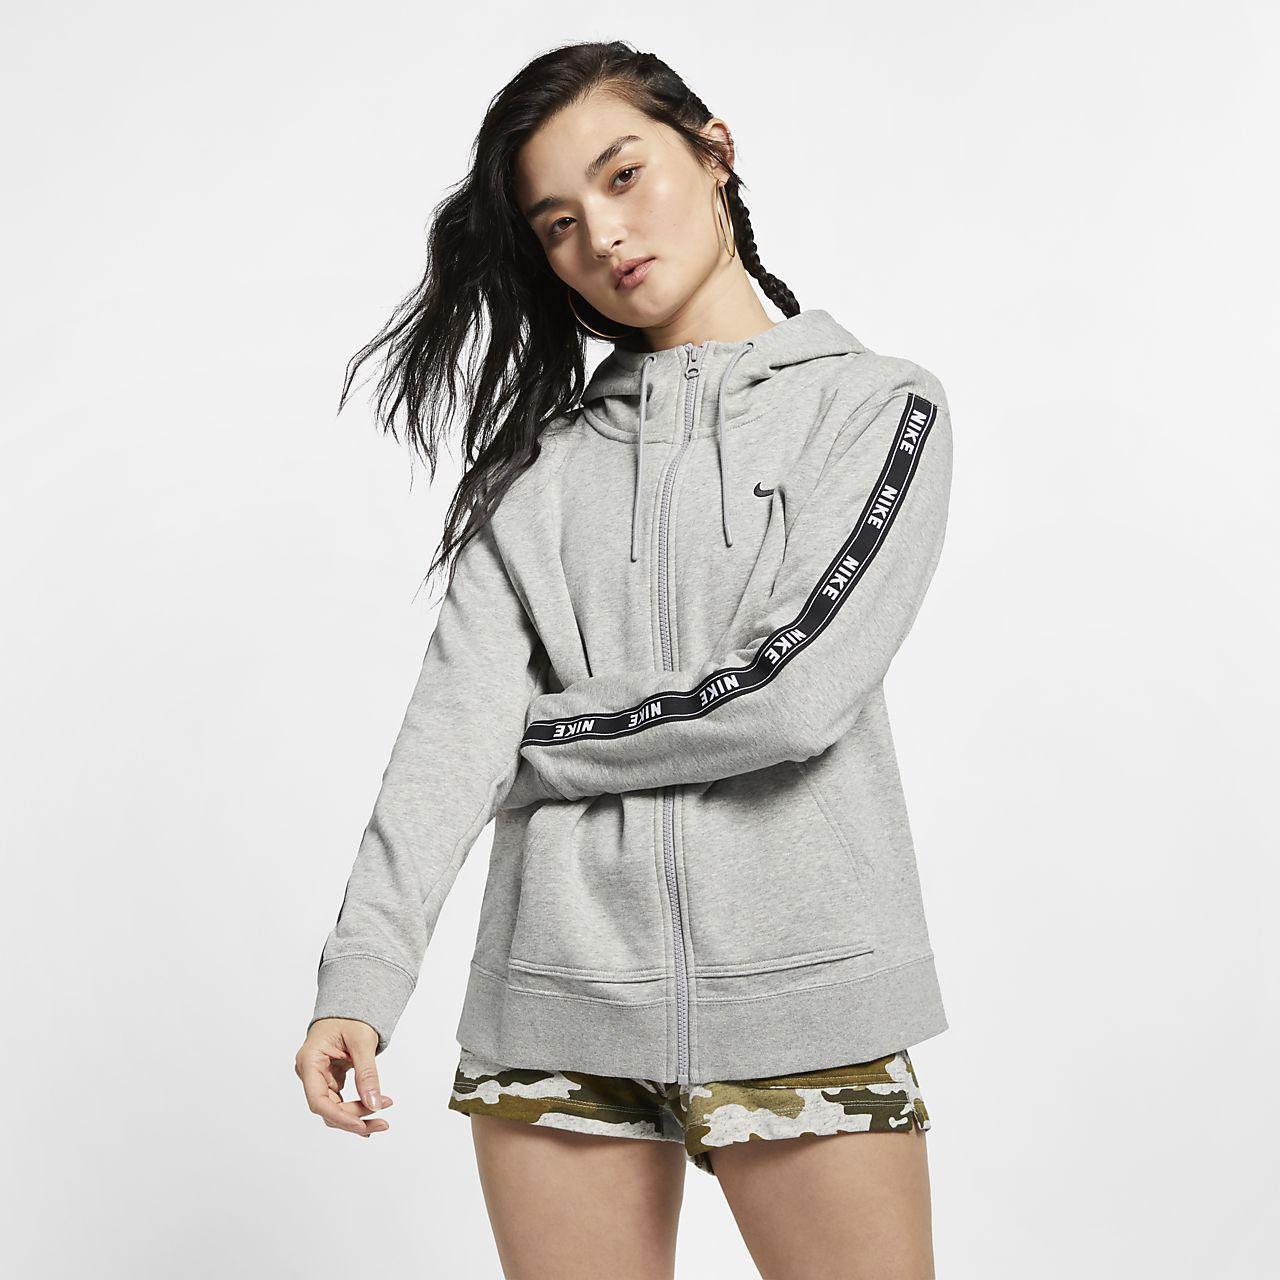 Capuche Avec Sweat Entièrement Sportswear Nike Zippé Pour À Logo nnxrwA5F